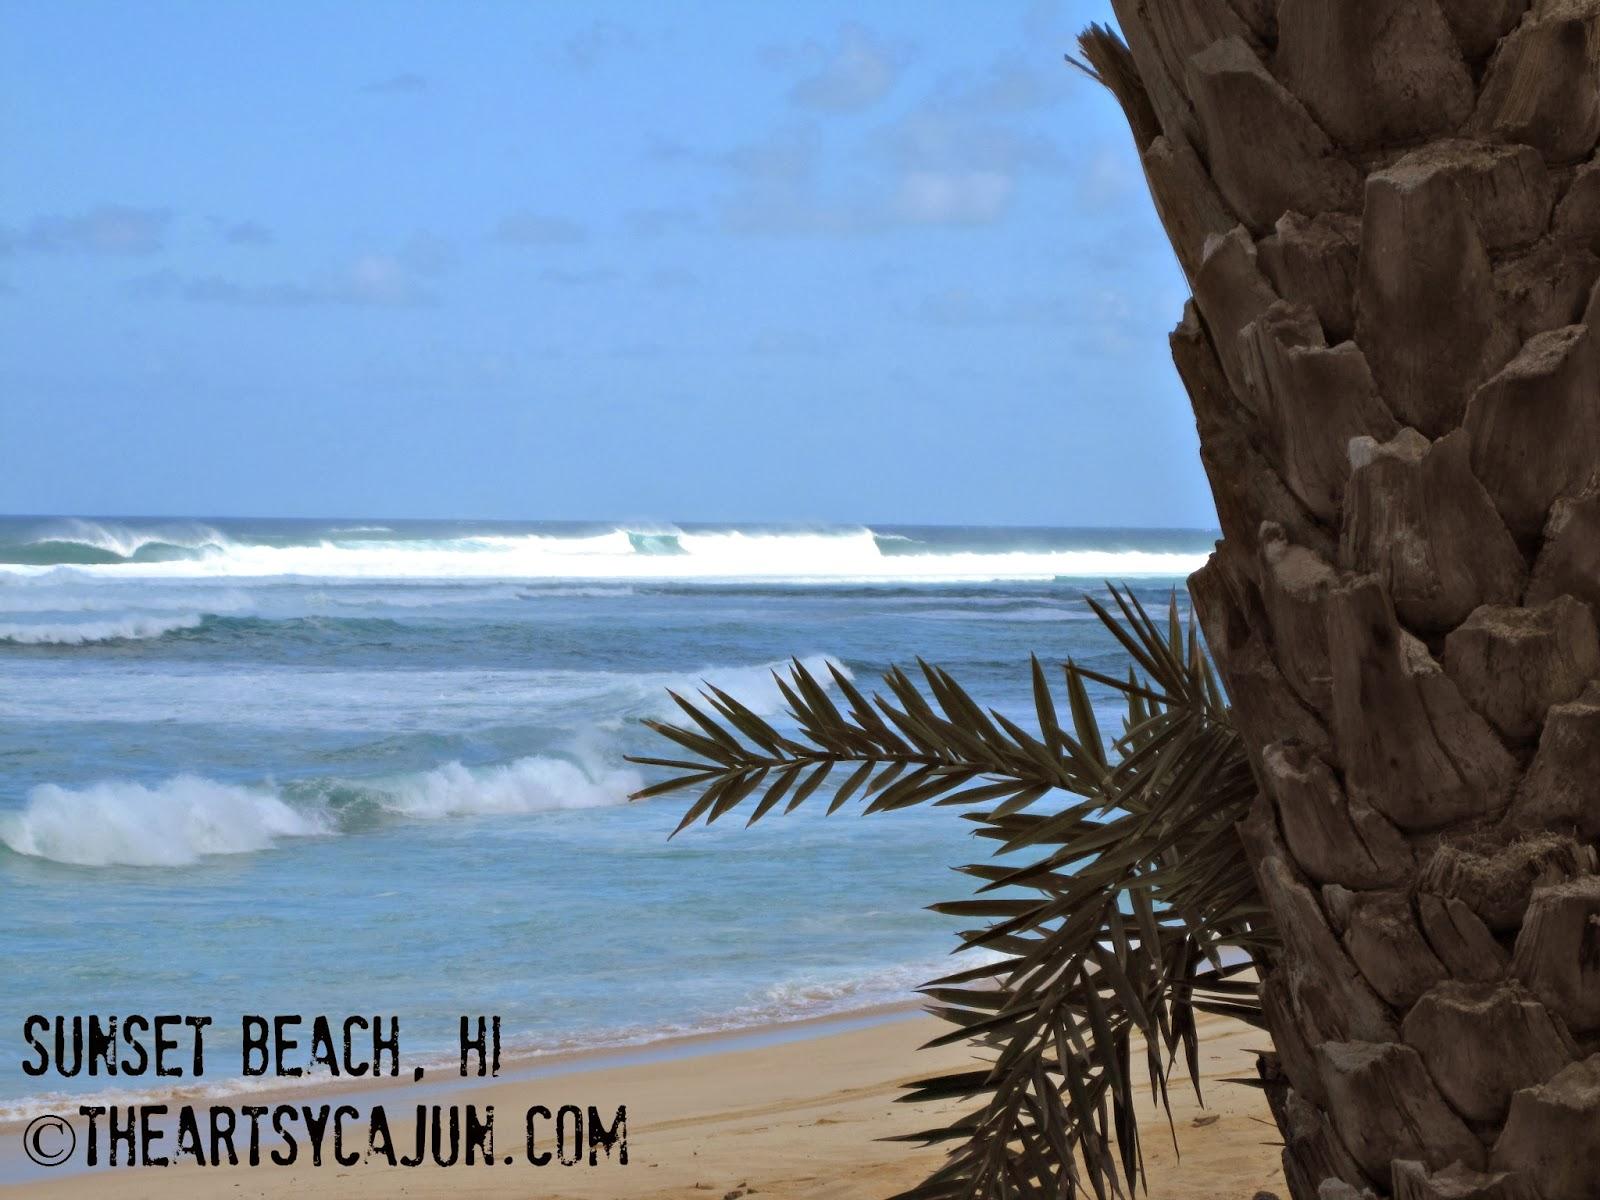 http://www.theartsycajun.com/2014/01/sunset-beach-days.html